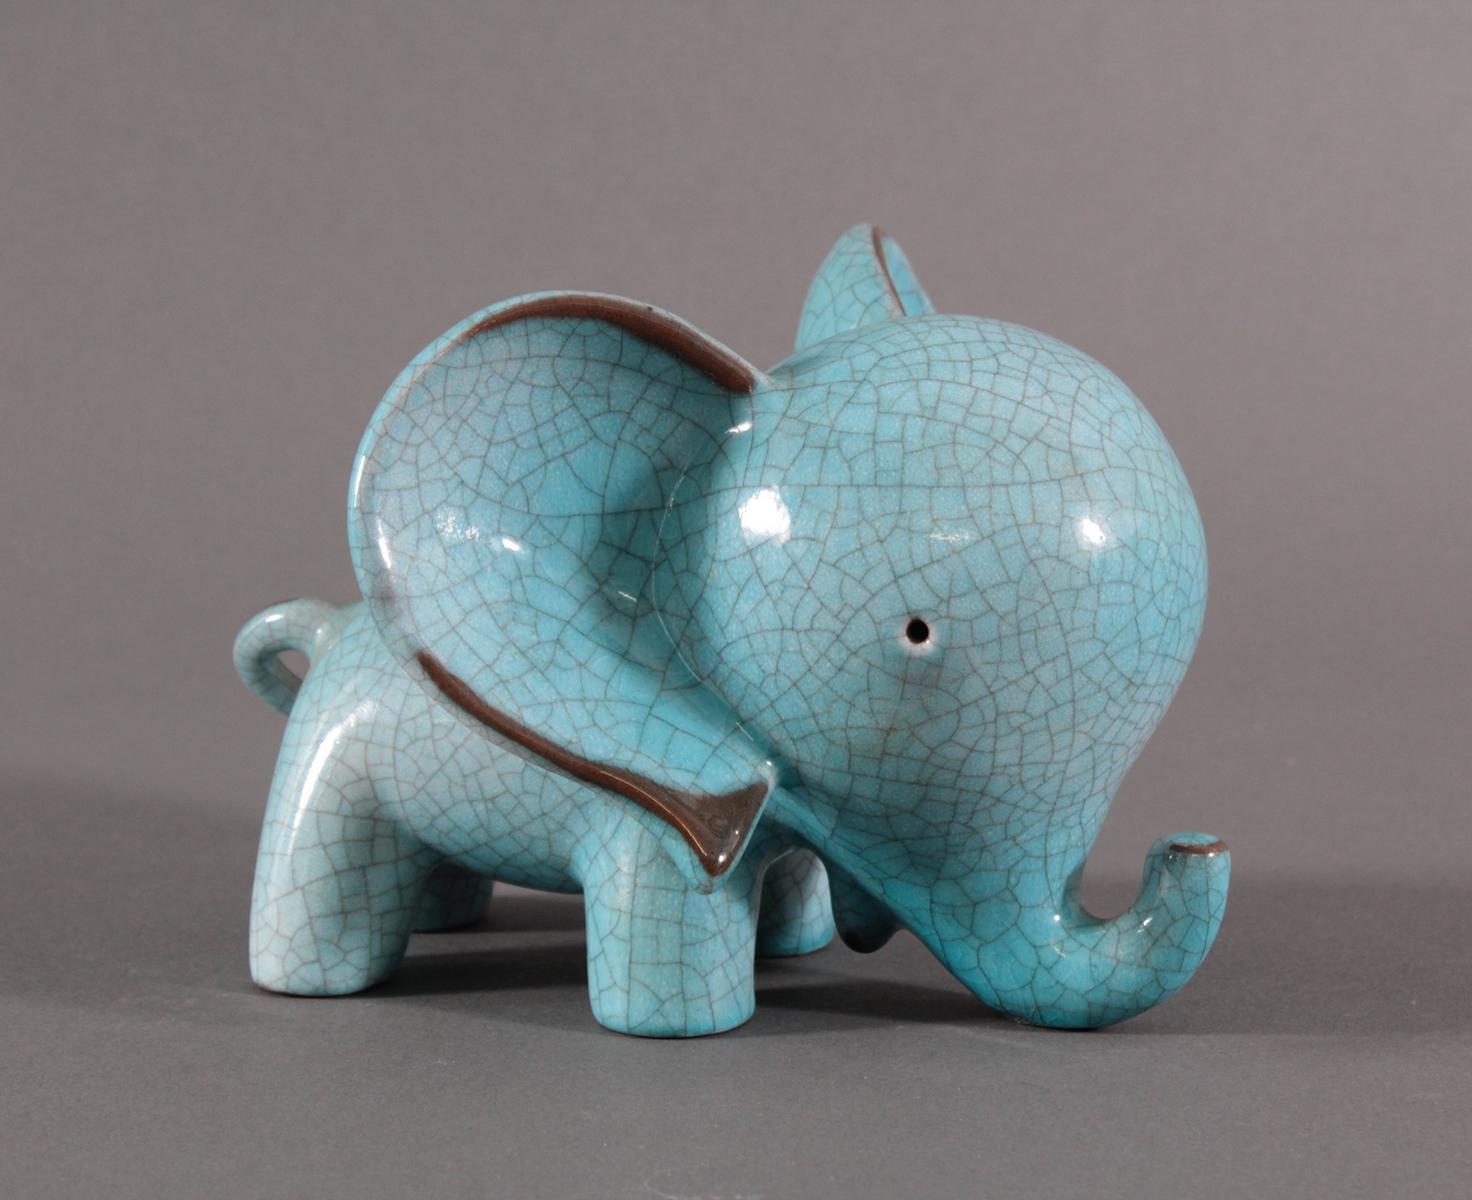 Keramik-Miniaturtierplastik, 'Elefant', Karlsruher Majolika, um 1956-88, Entw.: Walter Bosse-3